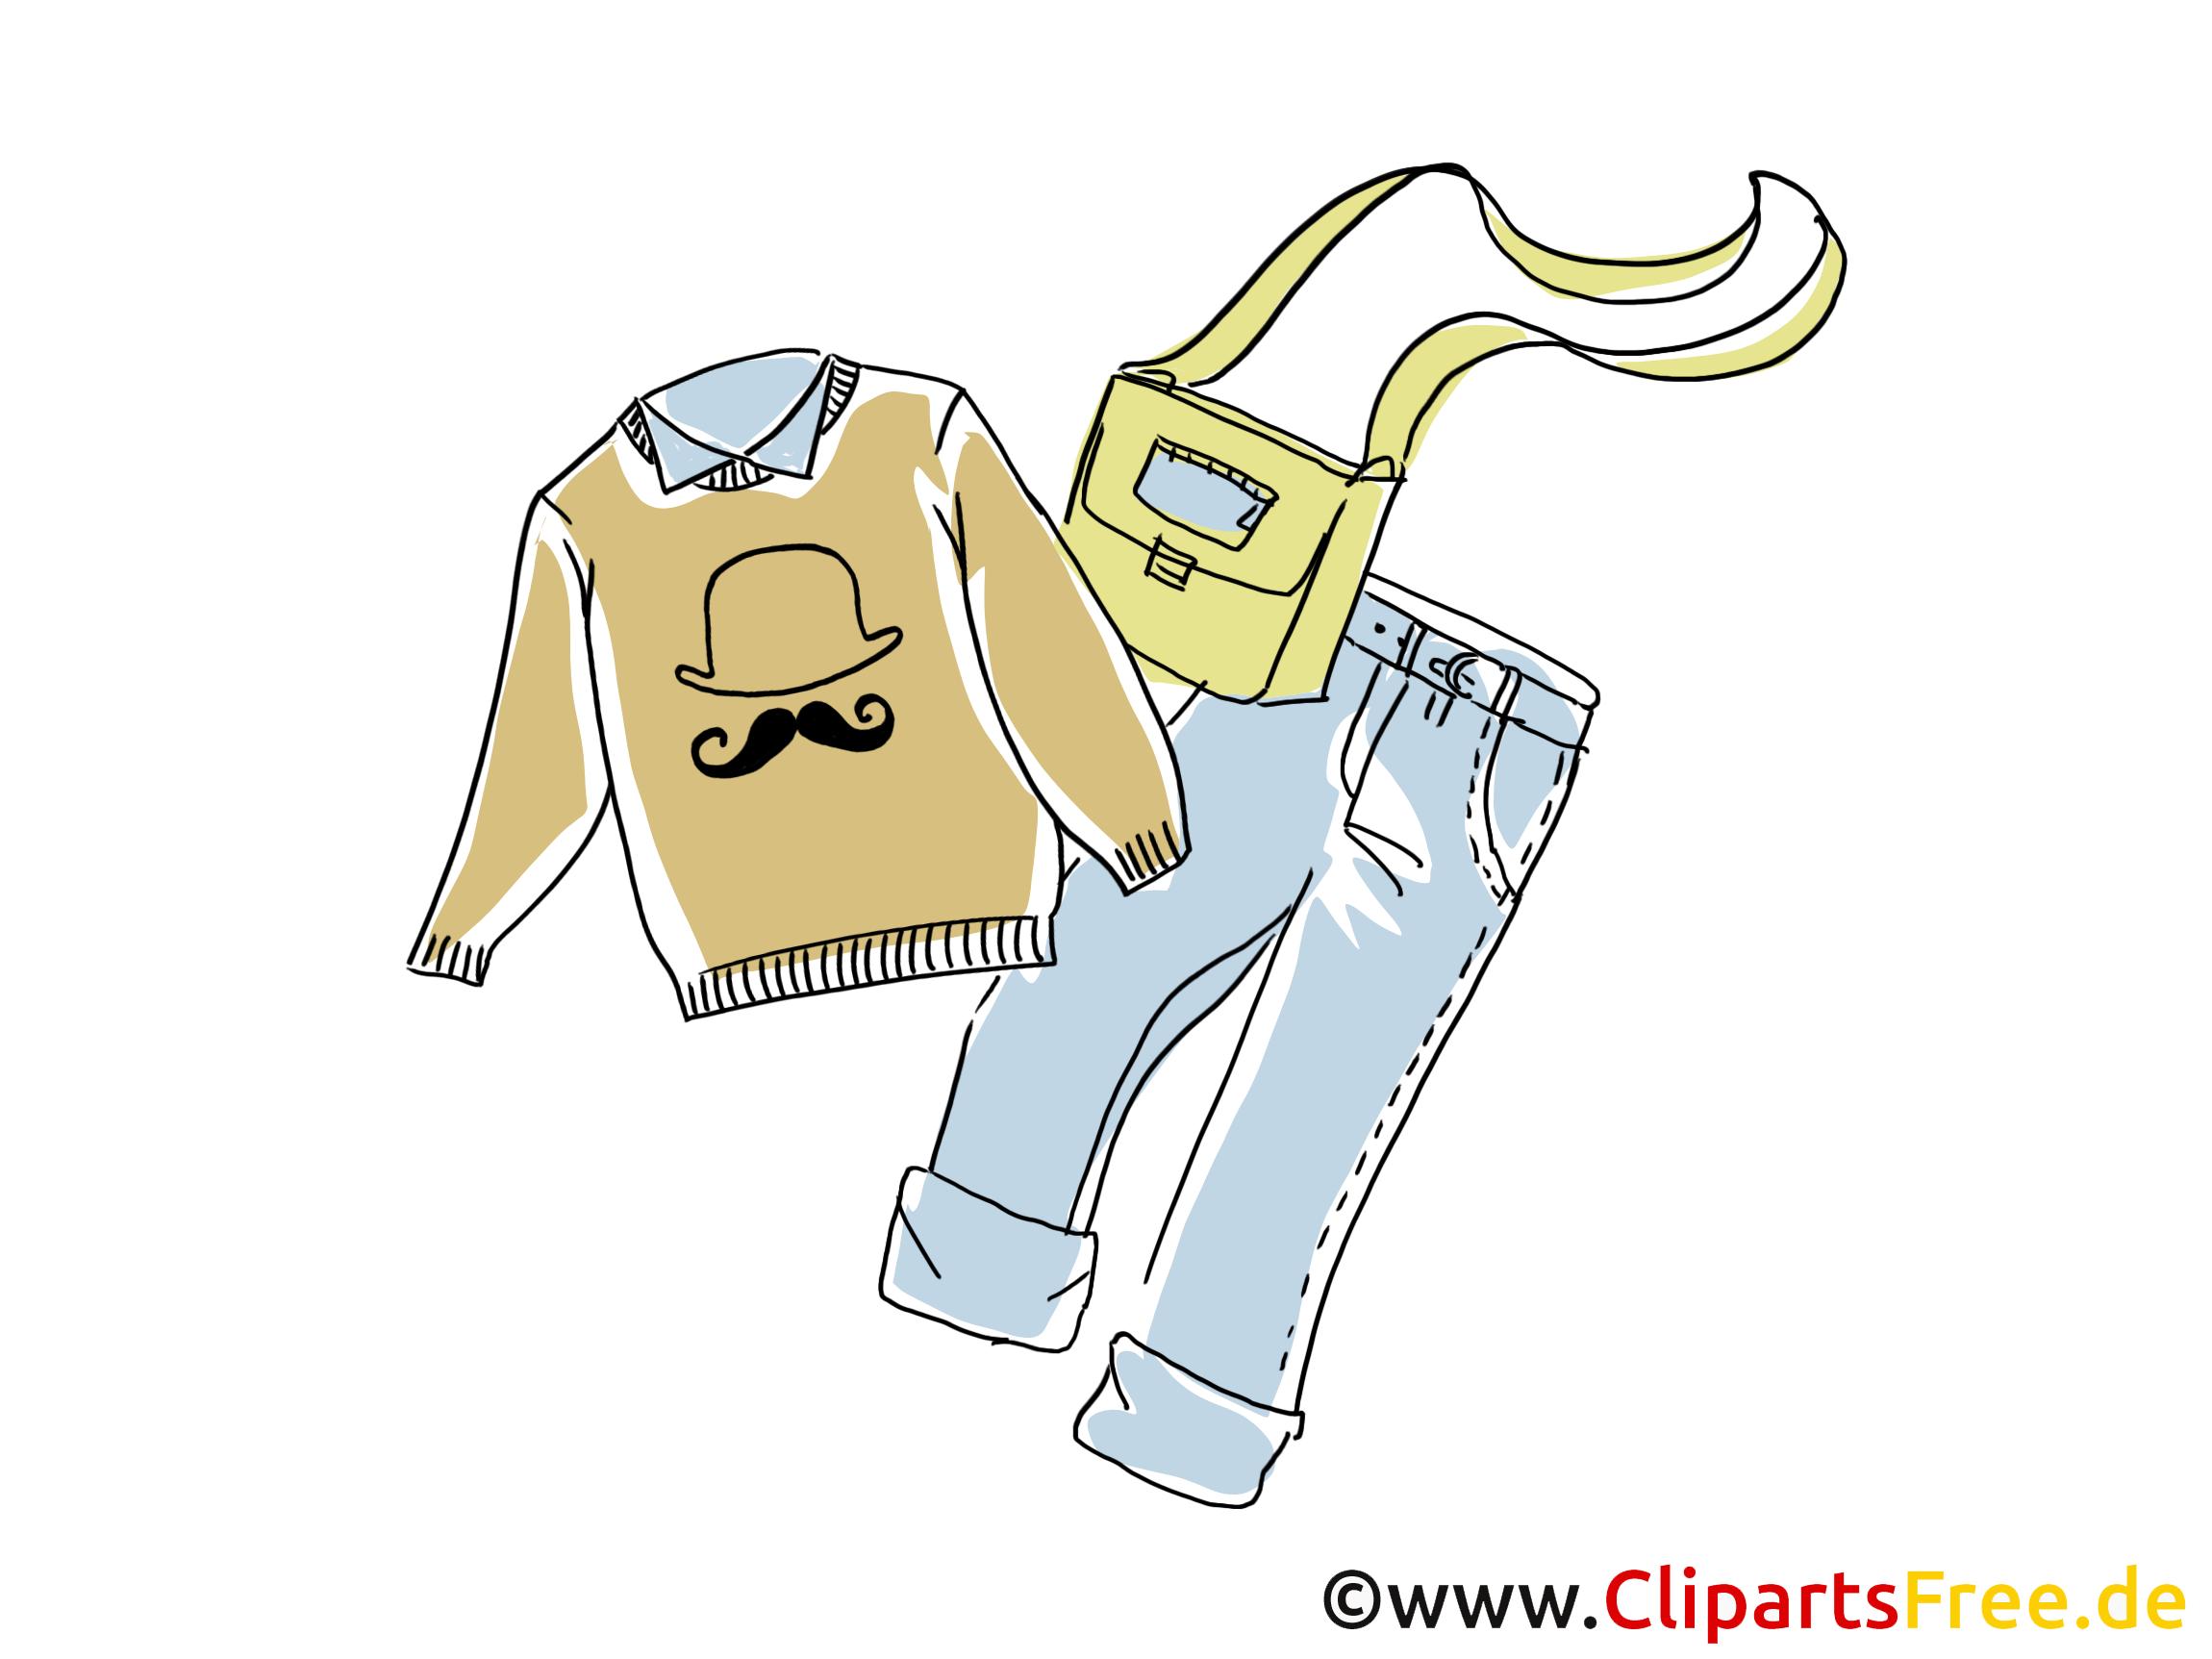 Pull-over jean clipart dessins gratuits